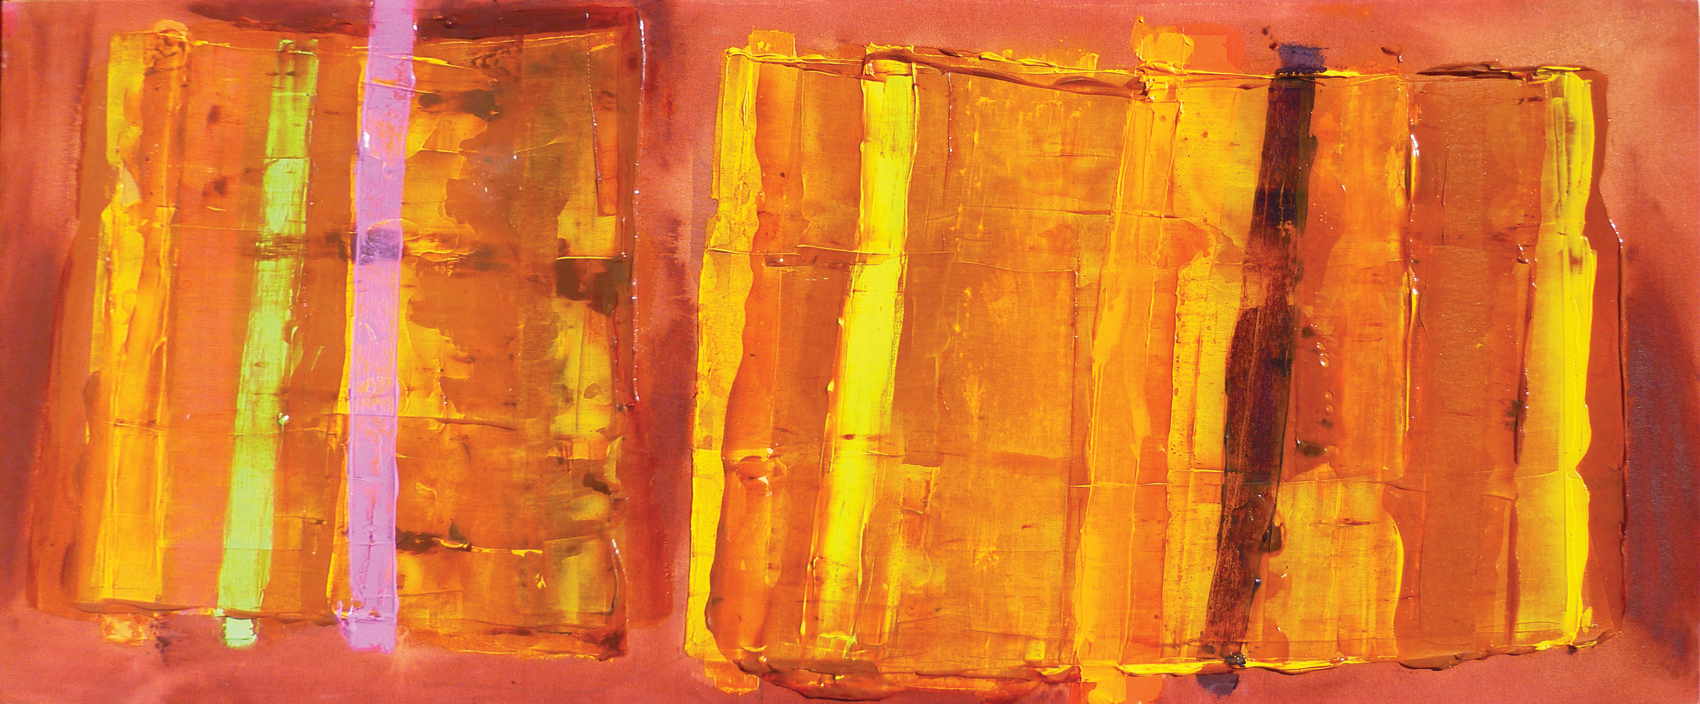 m12-arts-scott-plear-buster-bore